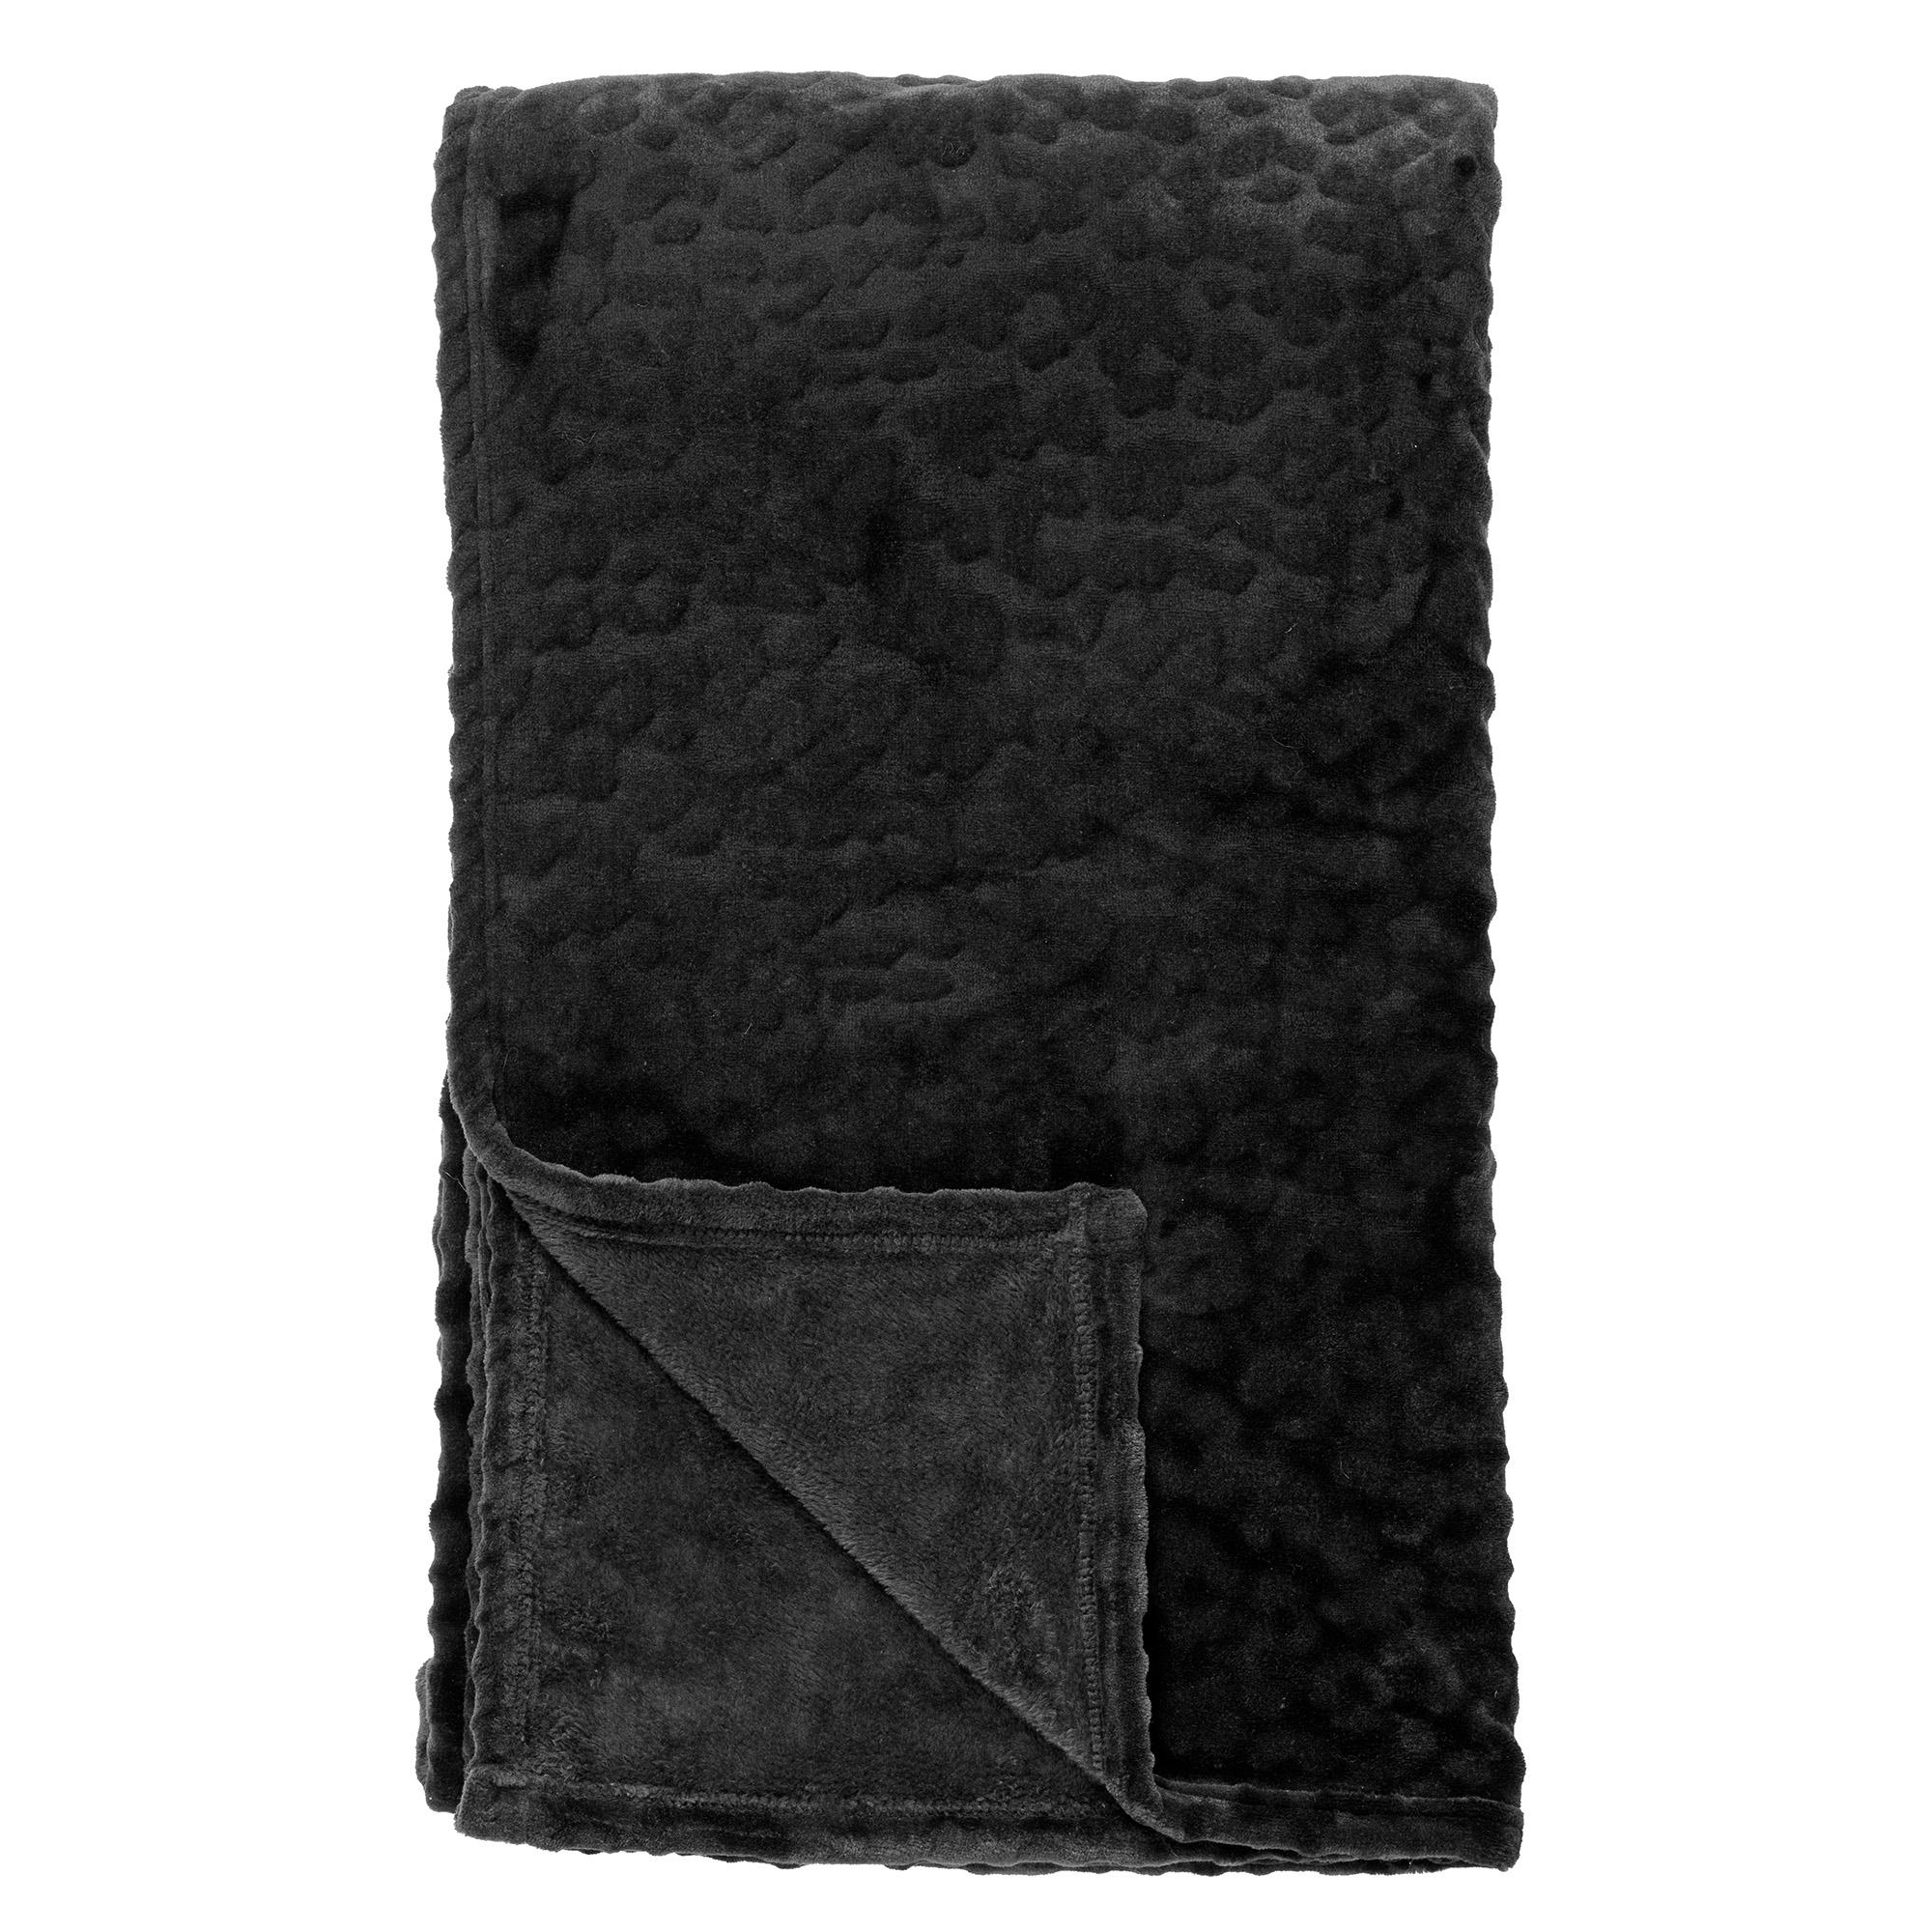 CHESTER - Plaid van fleece 150x200 cm Raven